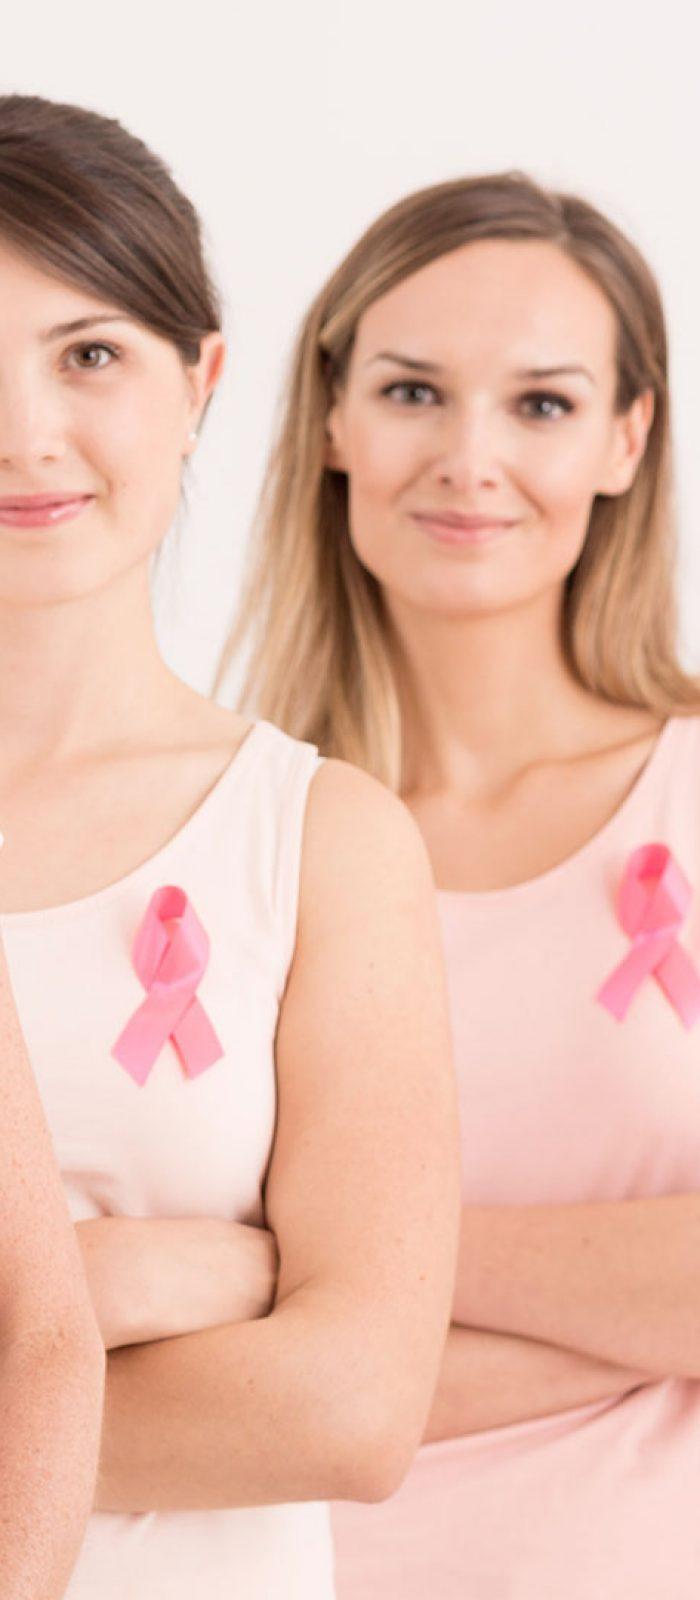 prevencione tumore seno medilab